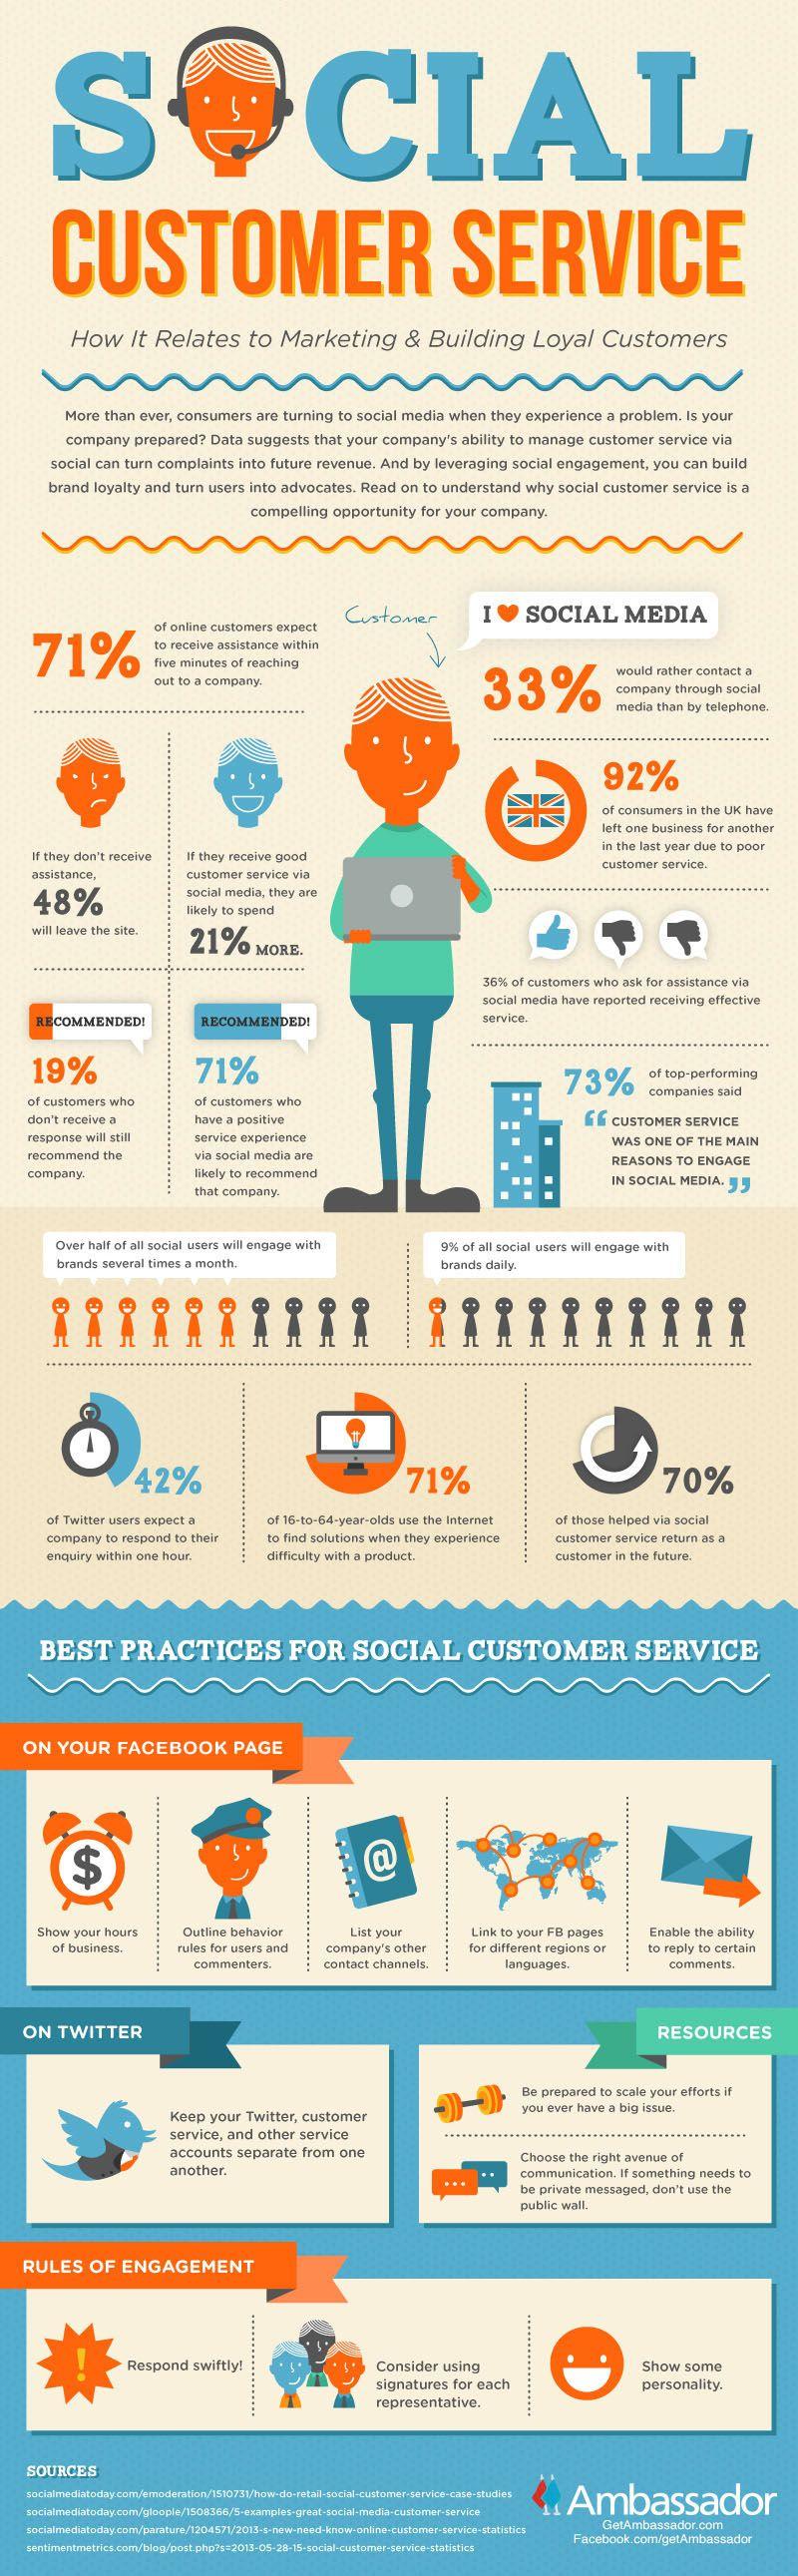 Social Customer Service Infographic Social Customer Service Social Media Customer Service Good Customer Service Skills